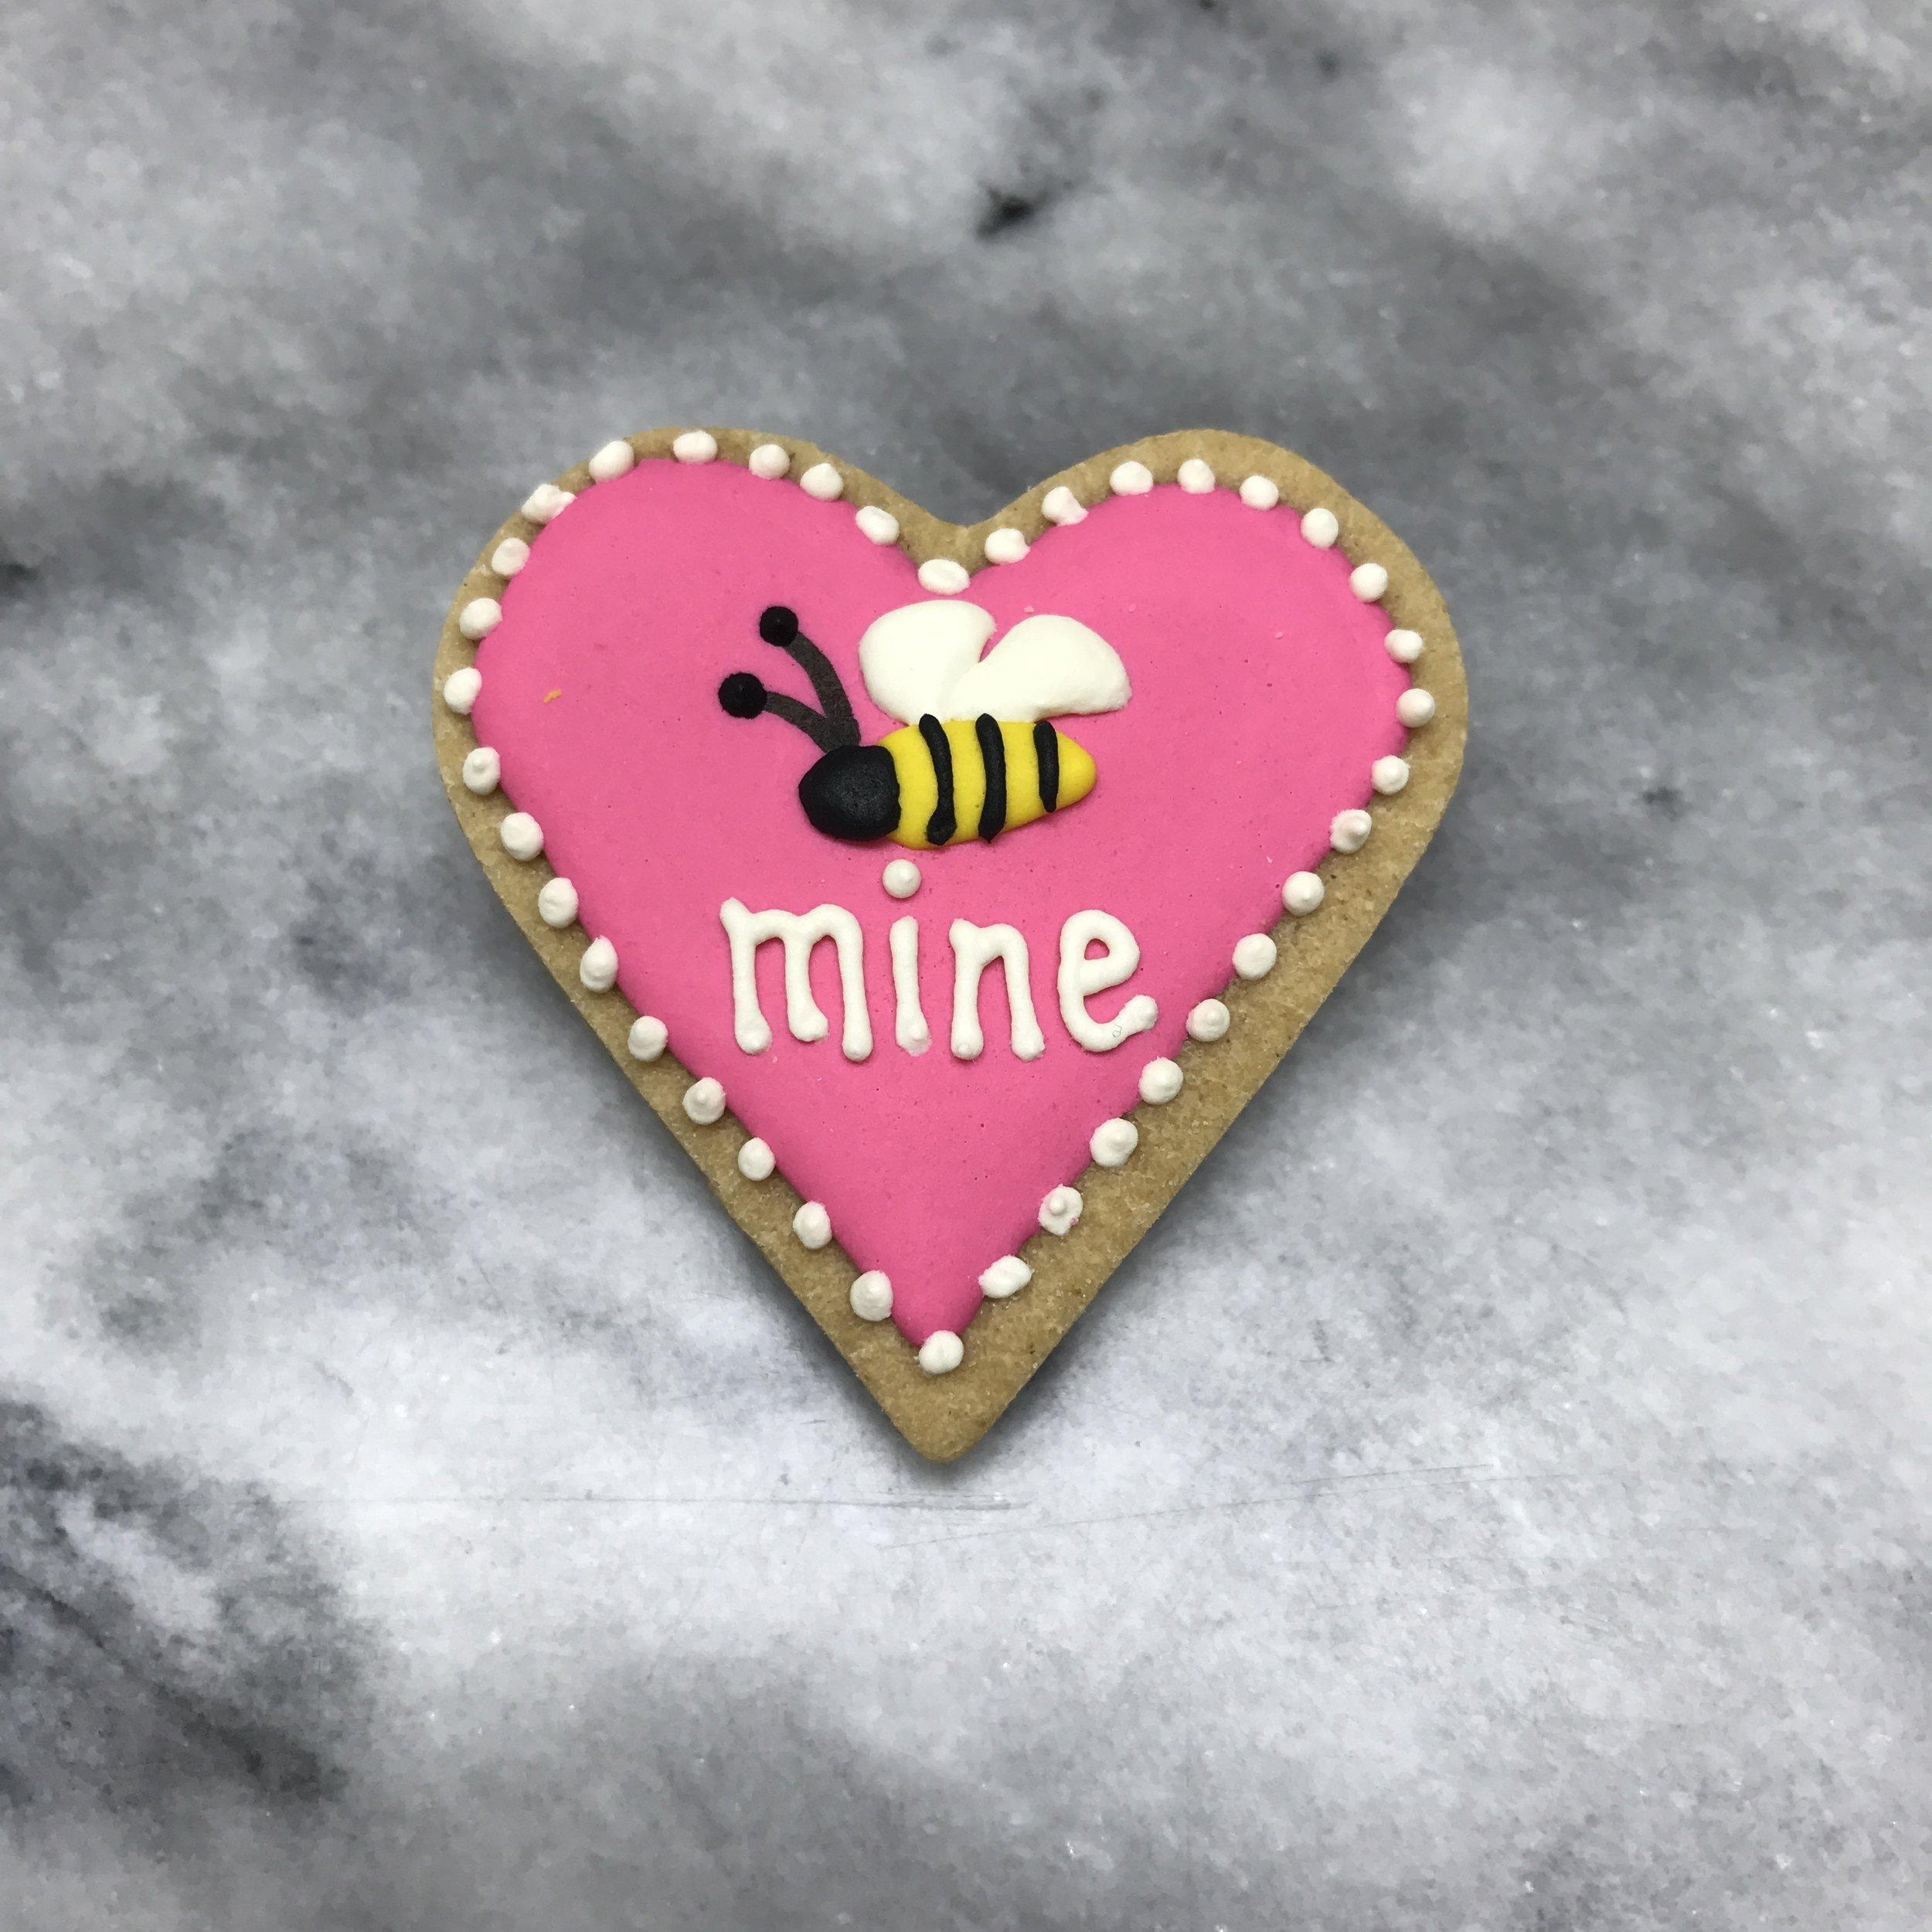 Bee Mine v2.JPG